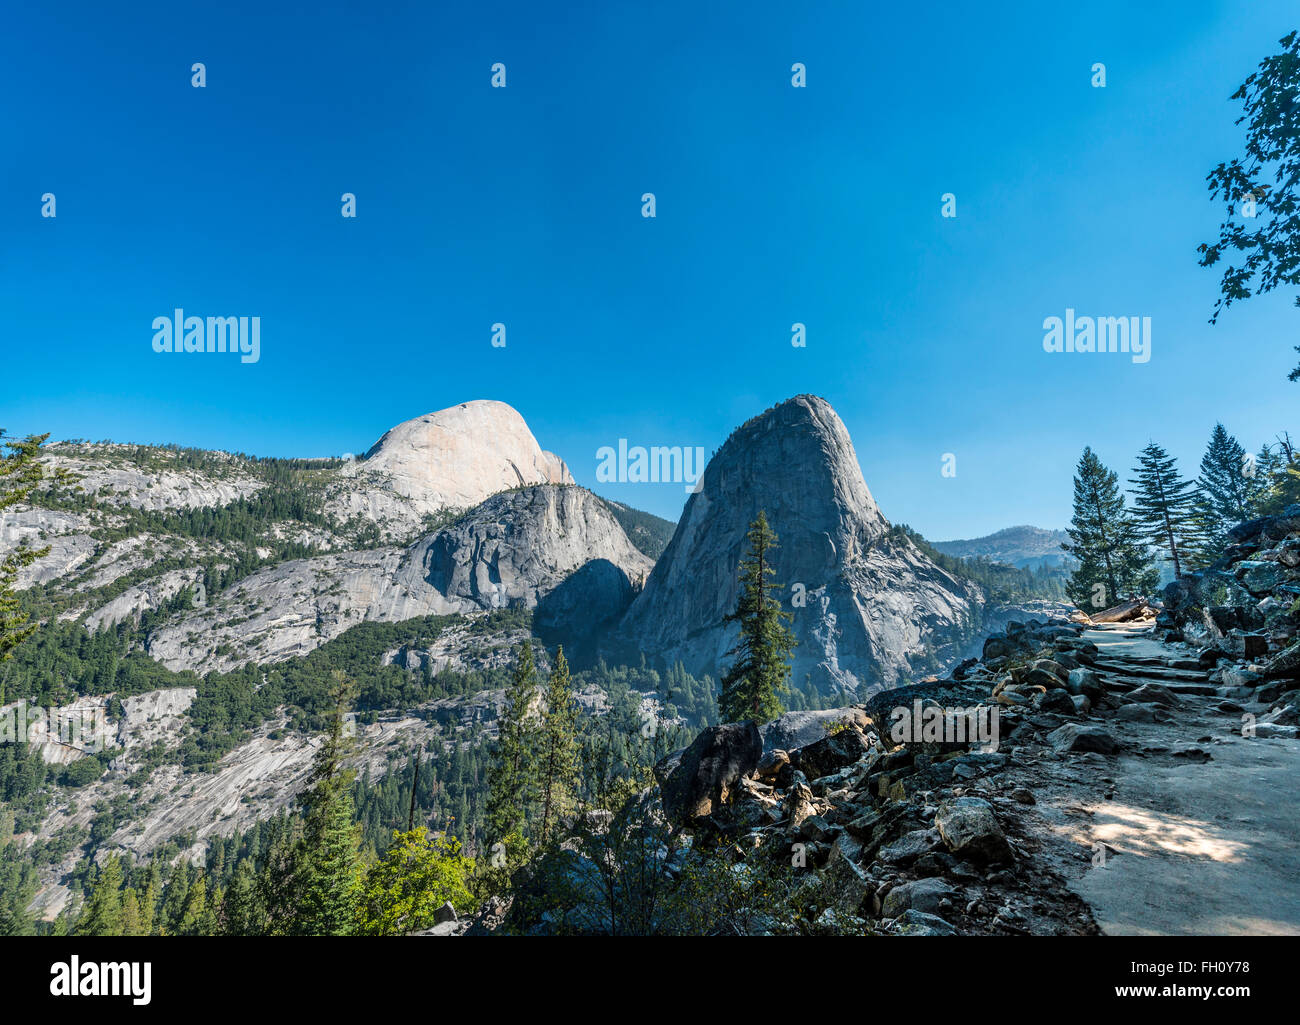 Liberty Cap, Yosemite-Nationalpark, Kalifornien, USA, Nordamerika Stockbild